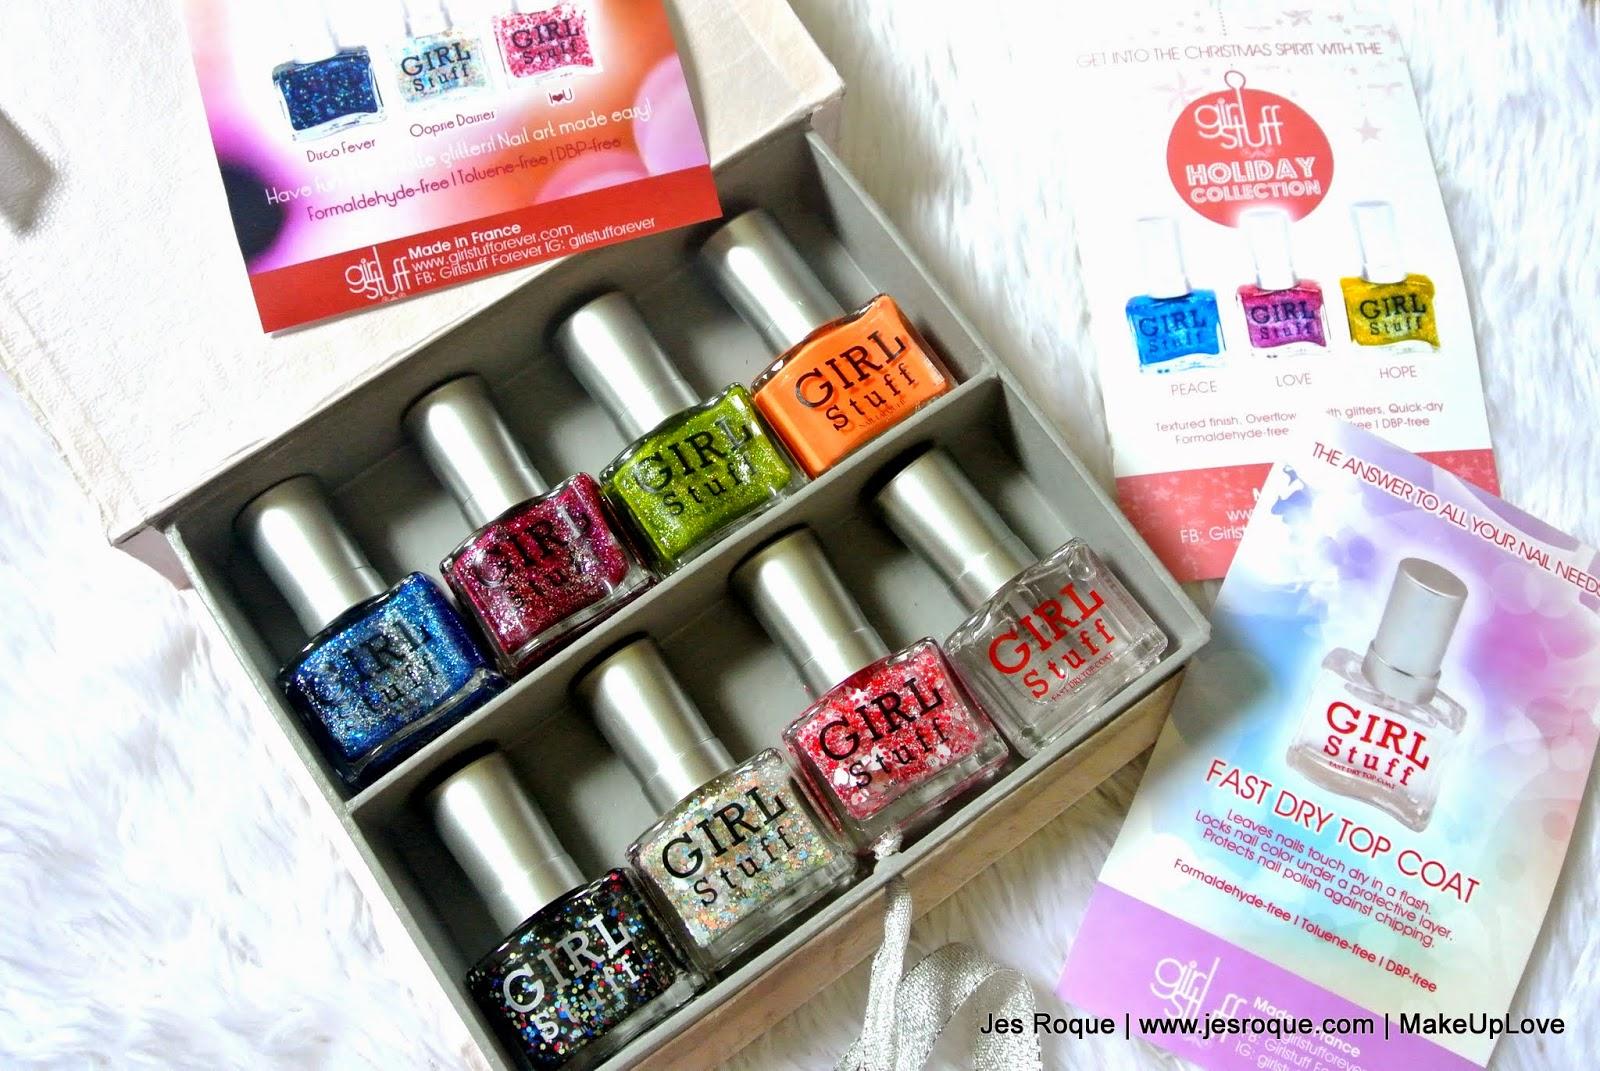 christmas 2014 gift guide girlstuff 2014 holiday collection - Girl Stuff For Christmas